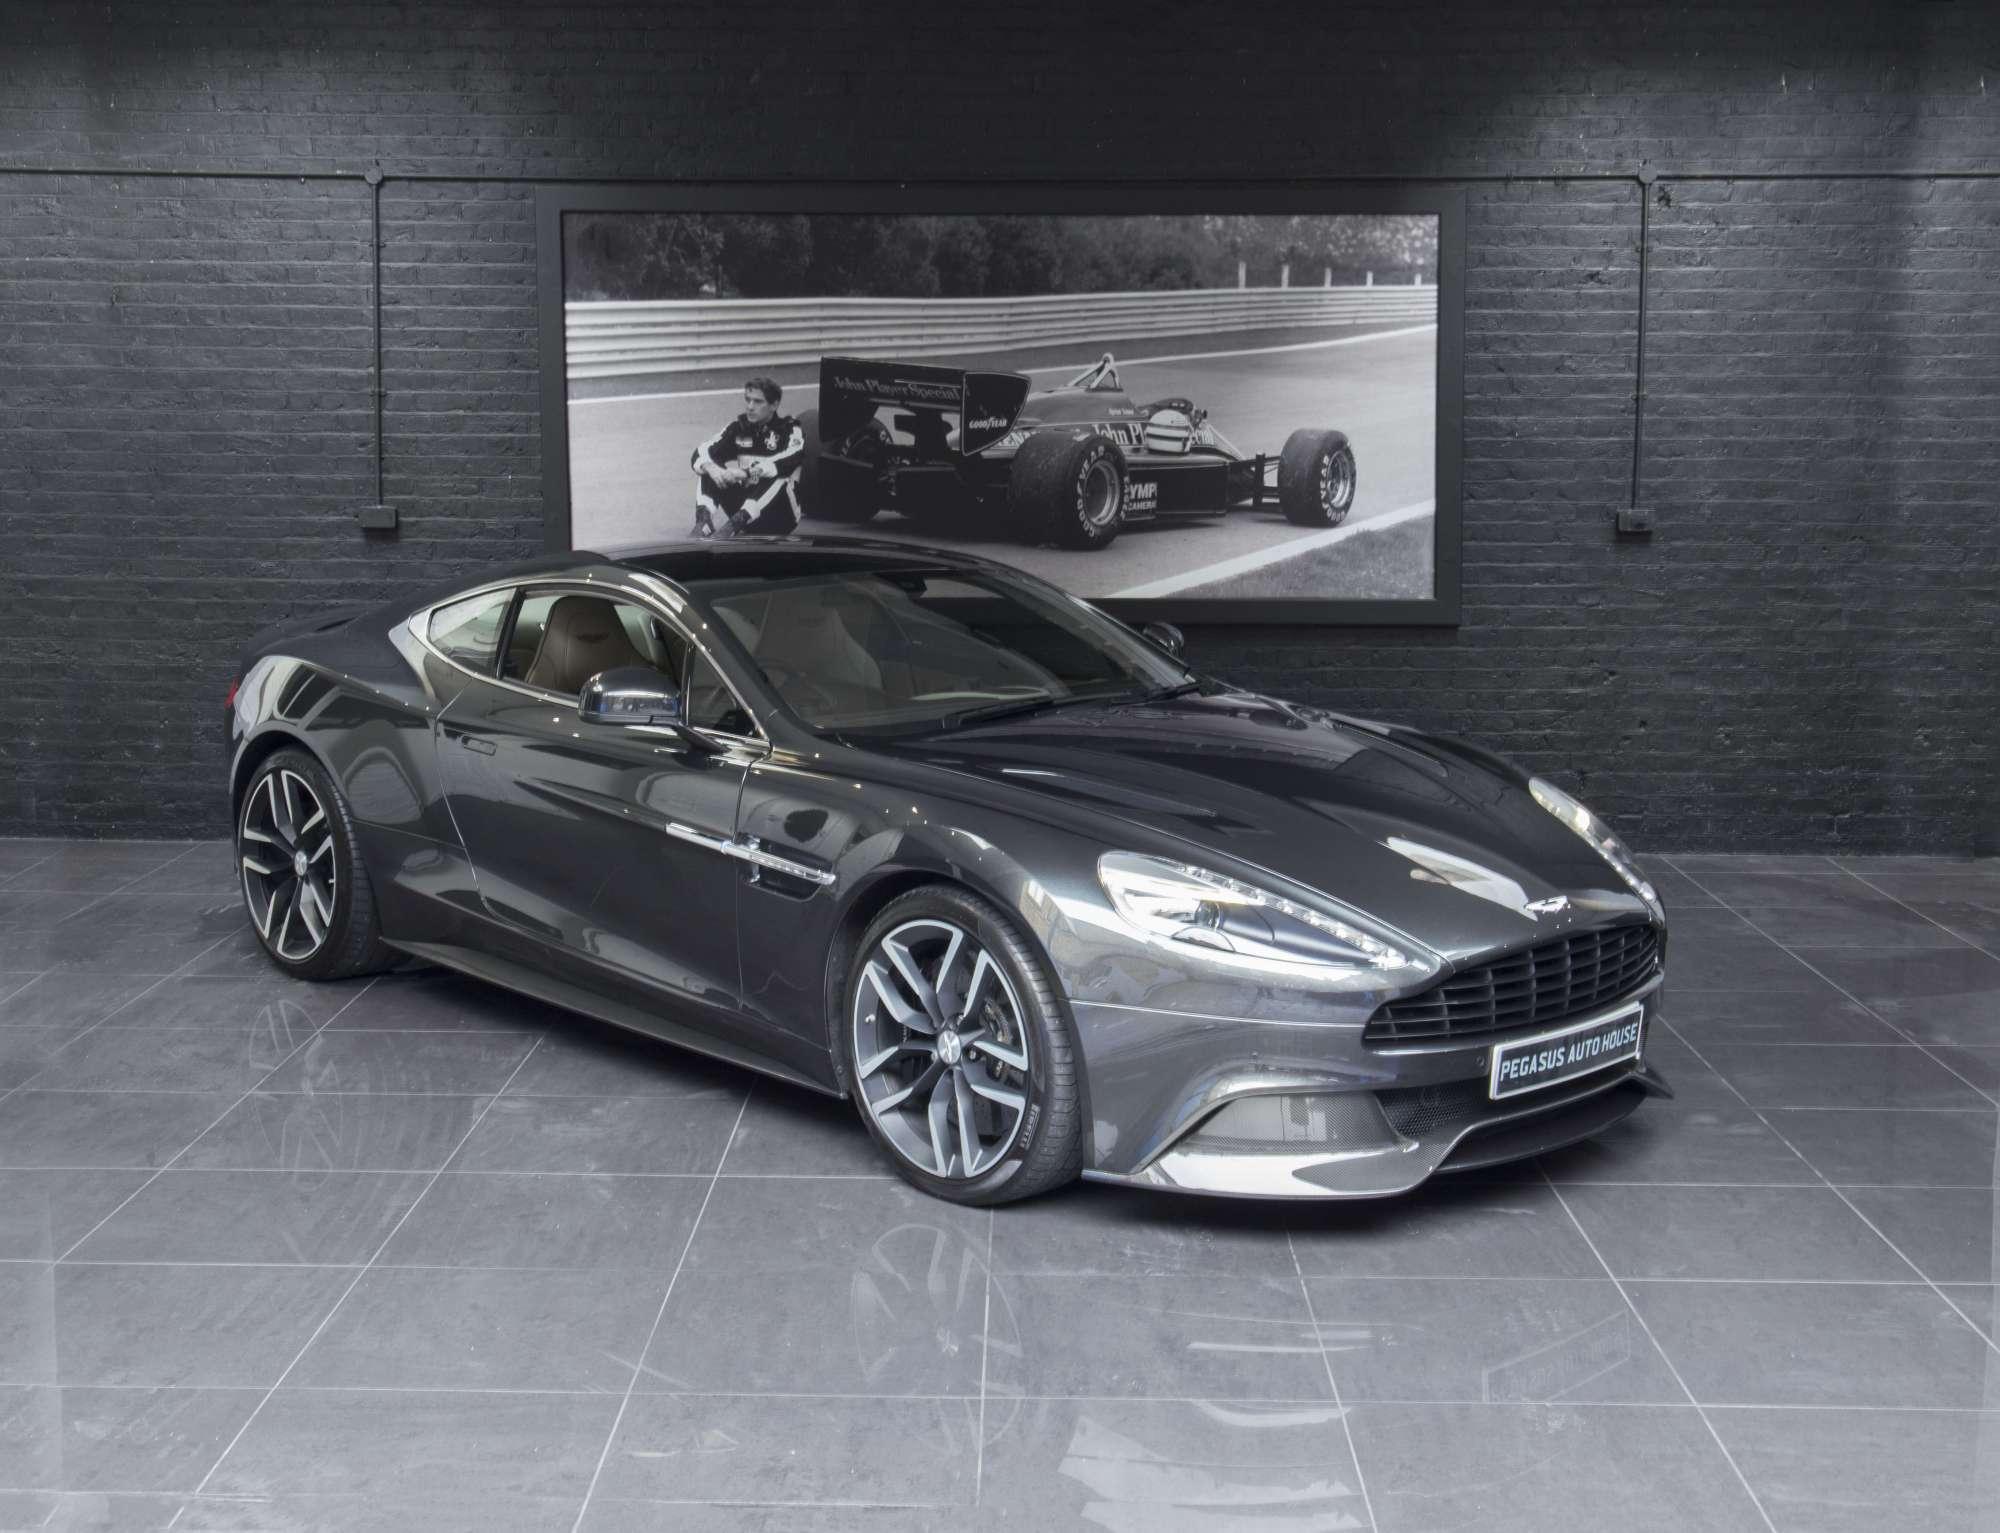 Aston Martin Vanquish Zf 8 Speed Gear Box Pegasus Auto House